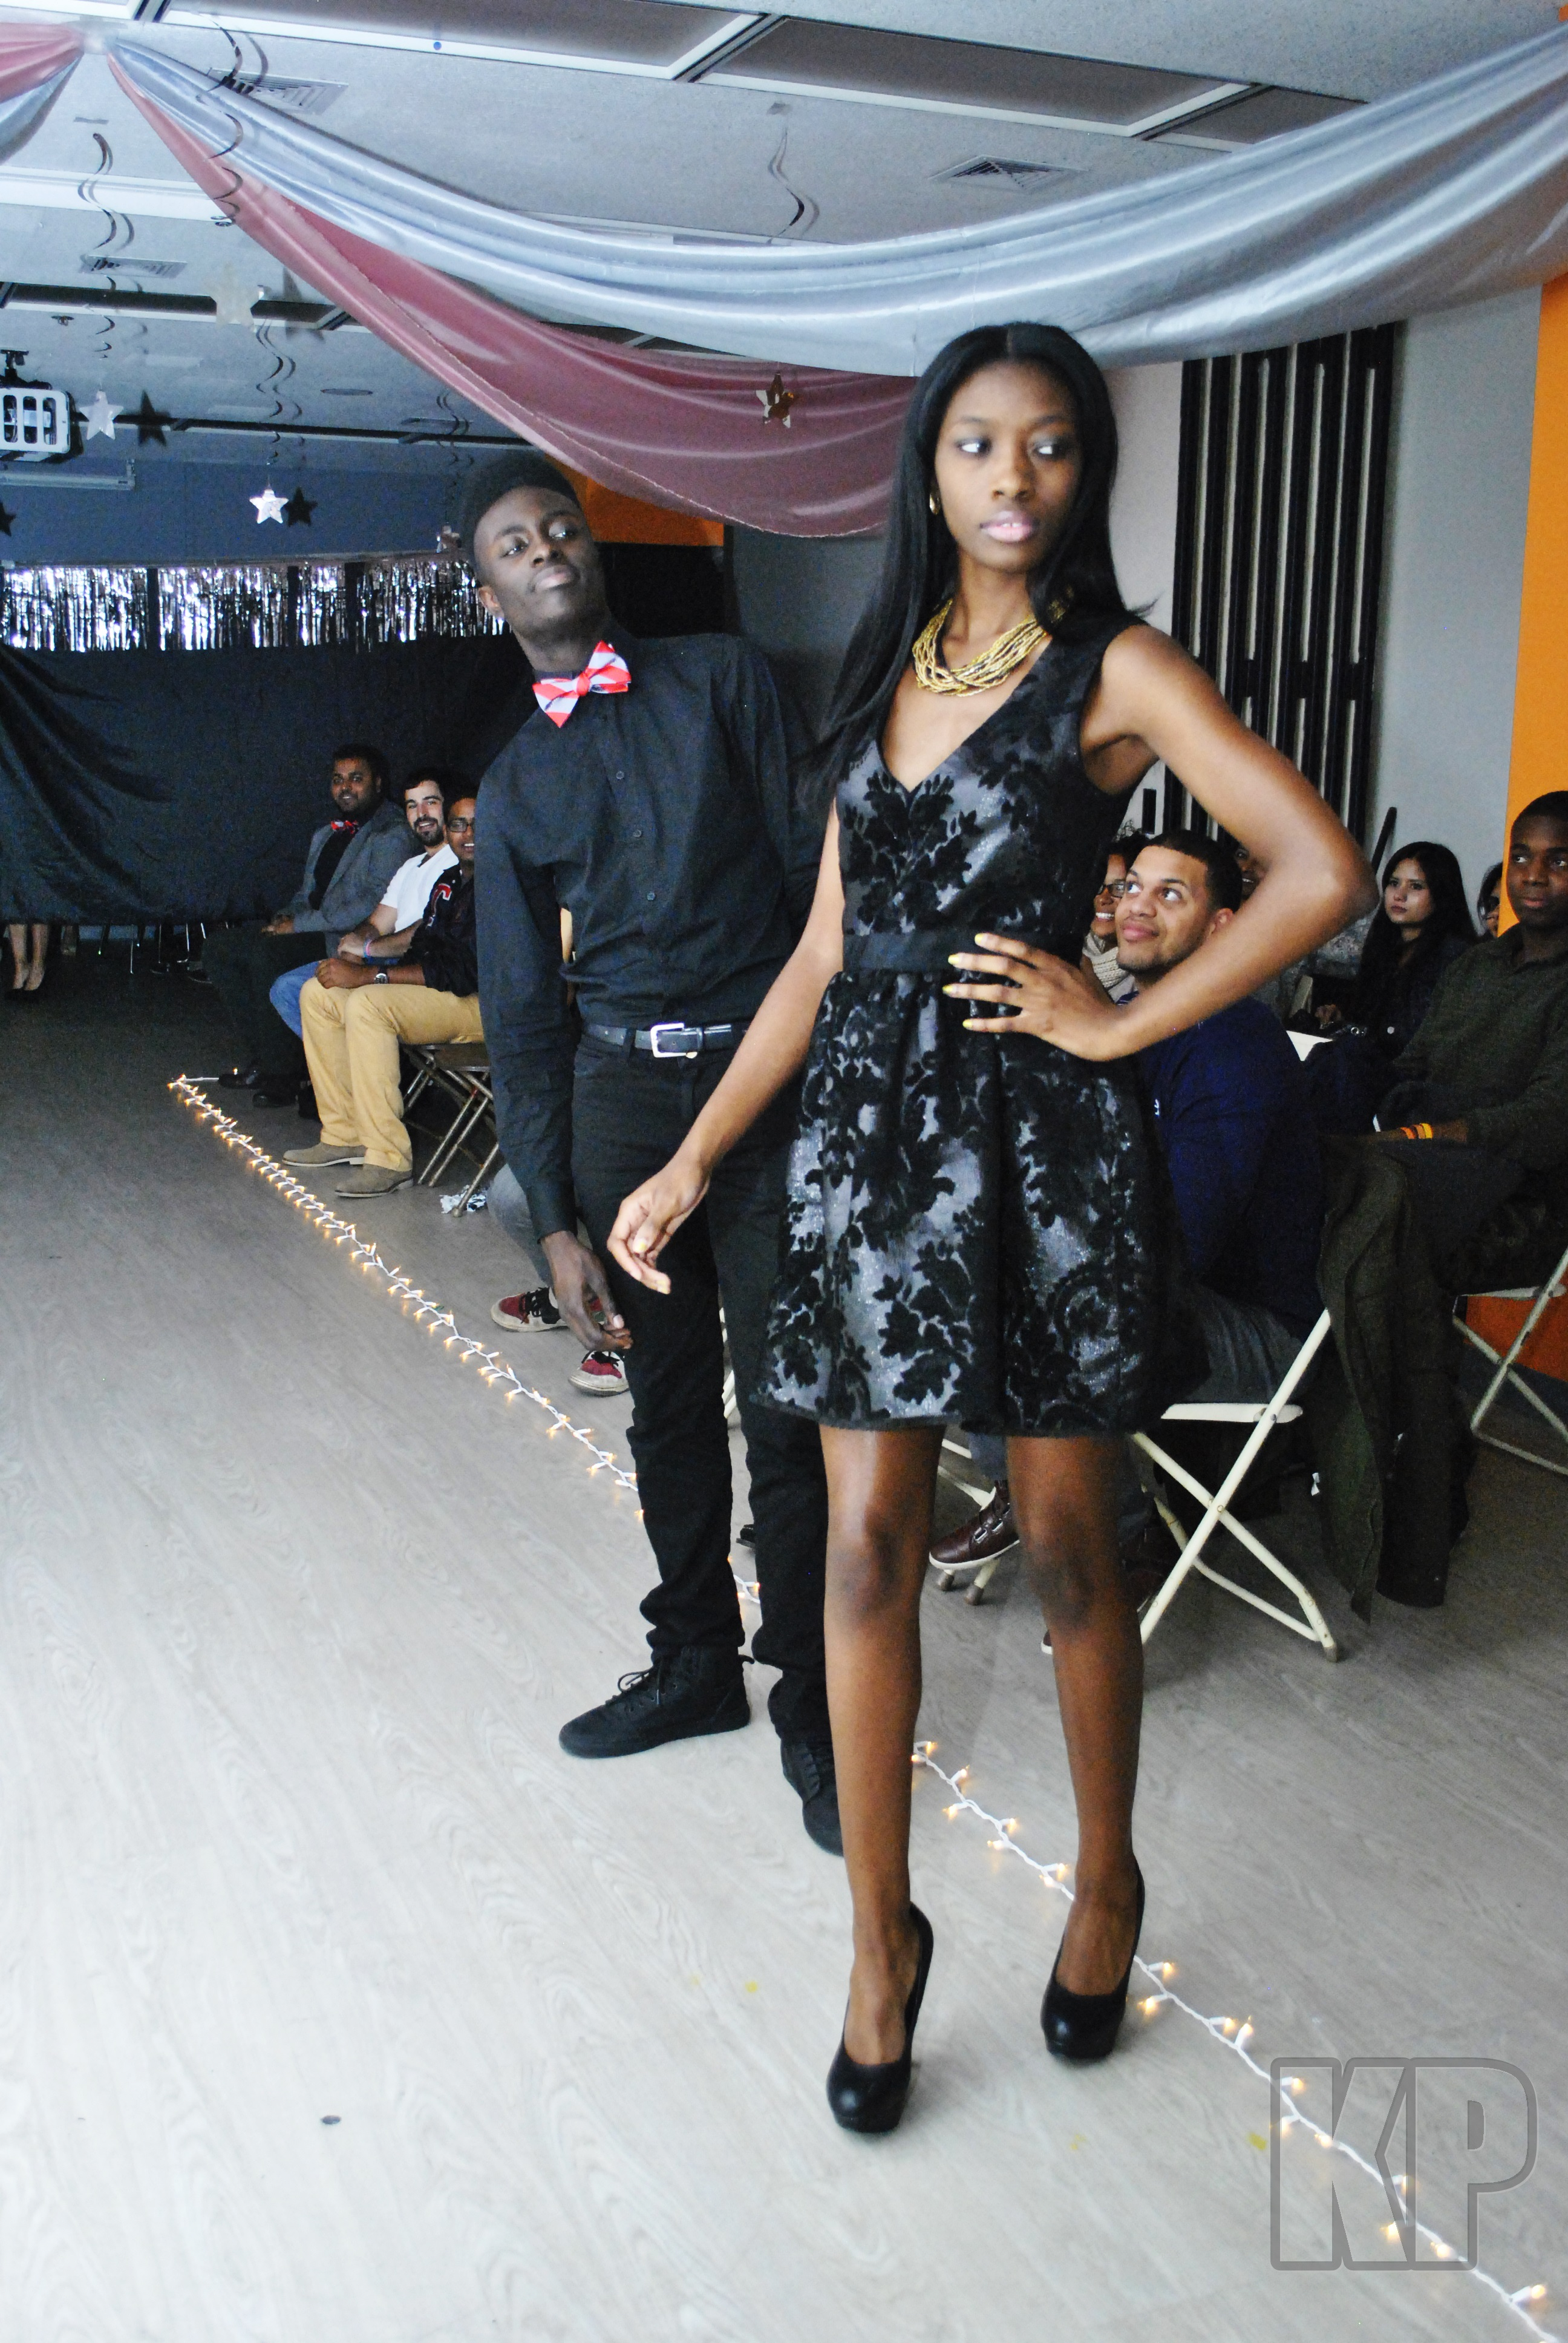 Fashion Show at CCNY!